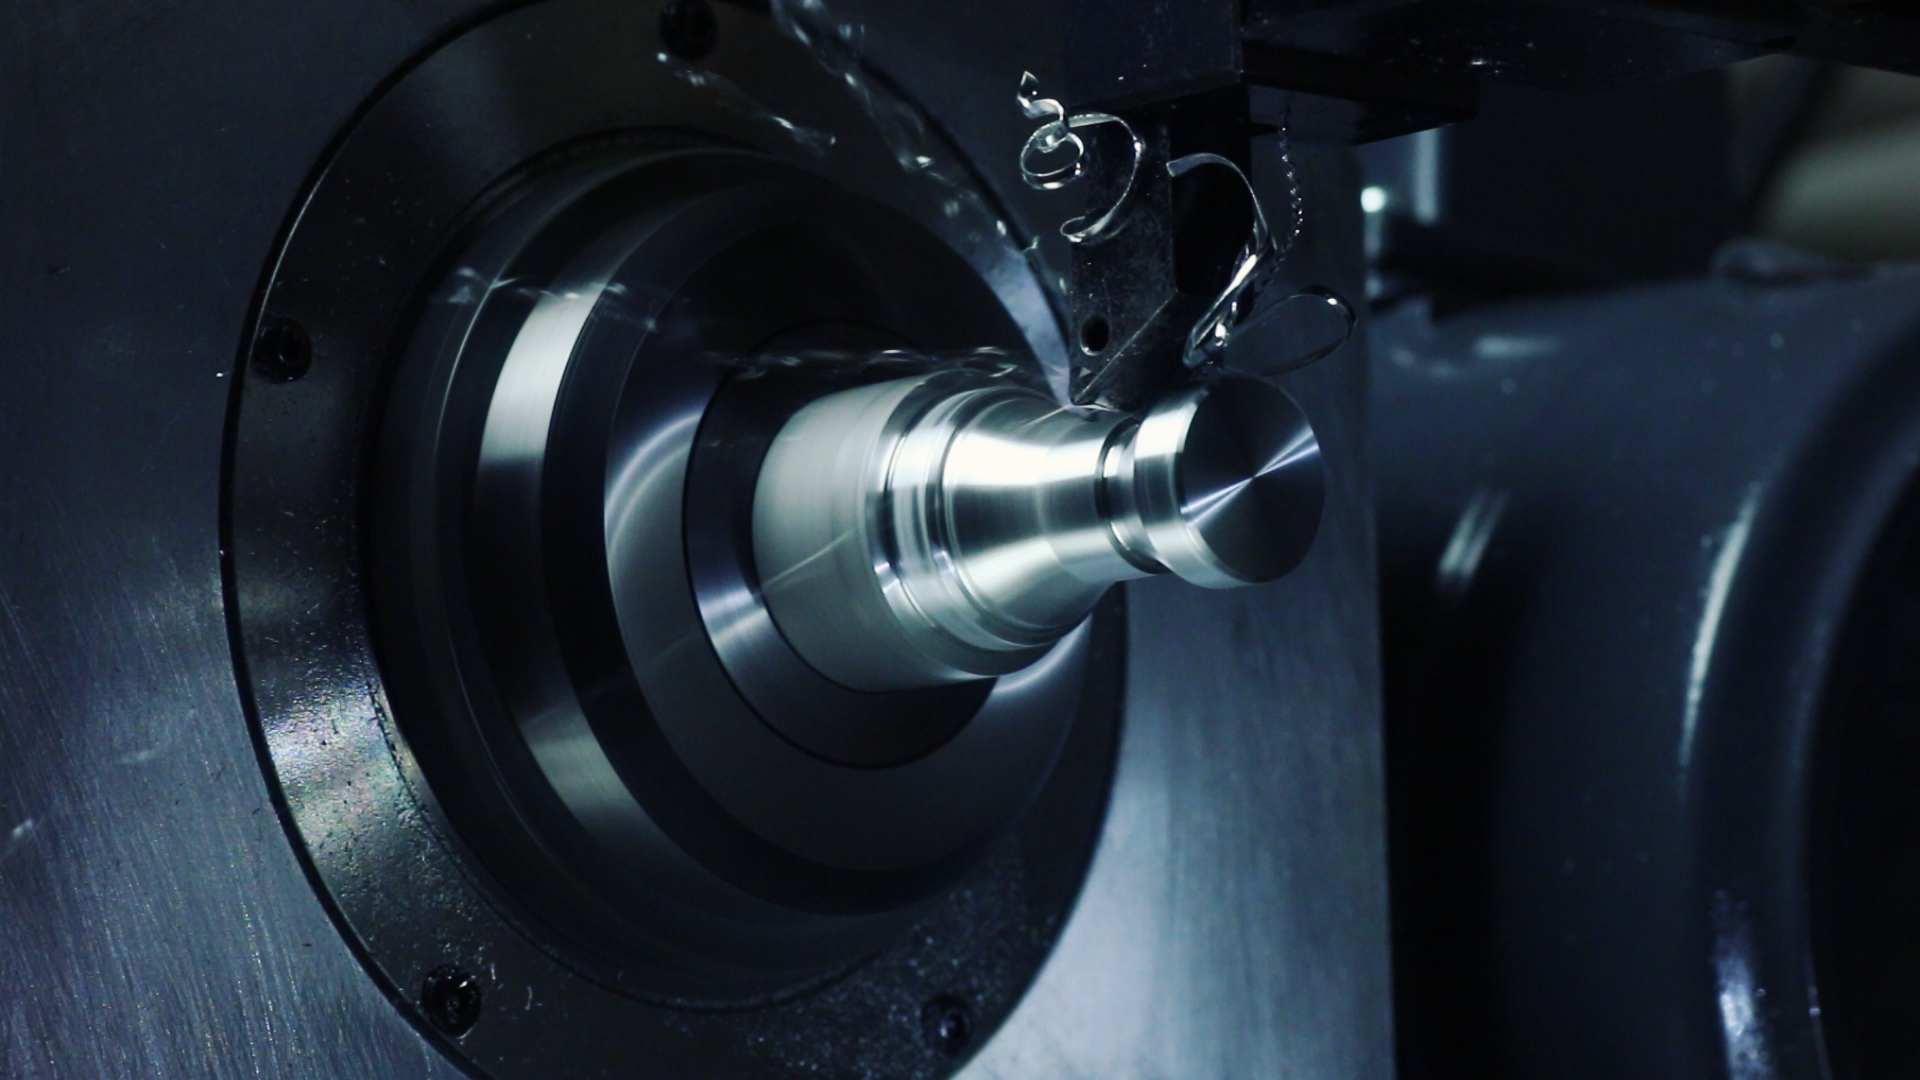 CNC Wallpaper Rapidturn Cutting jpg Image